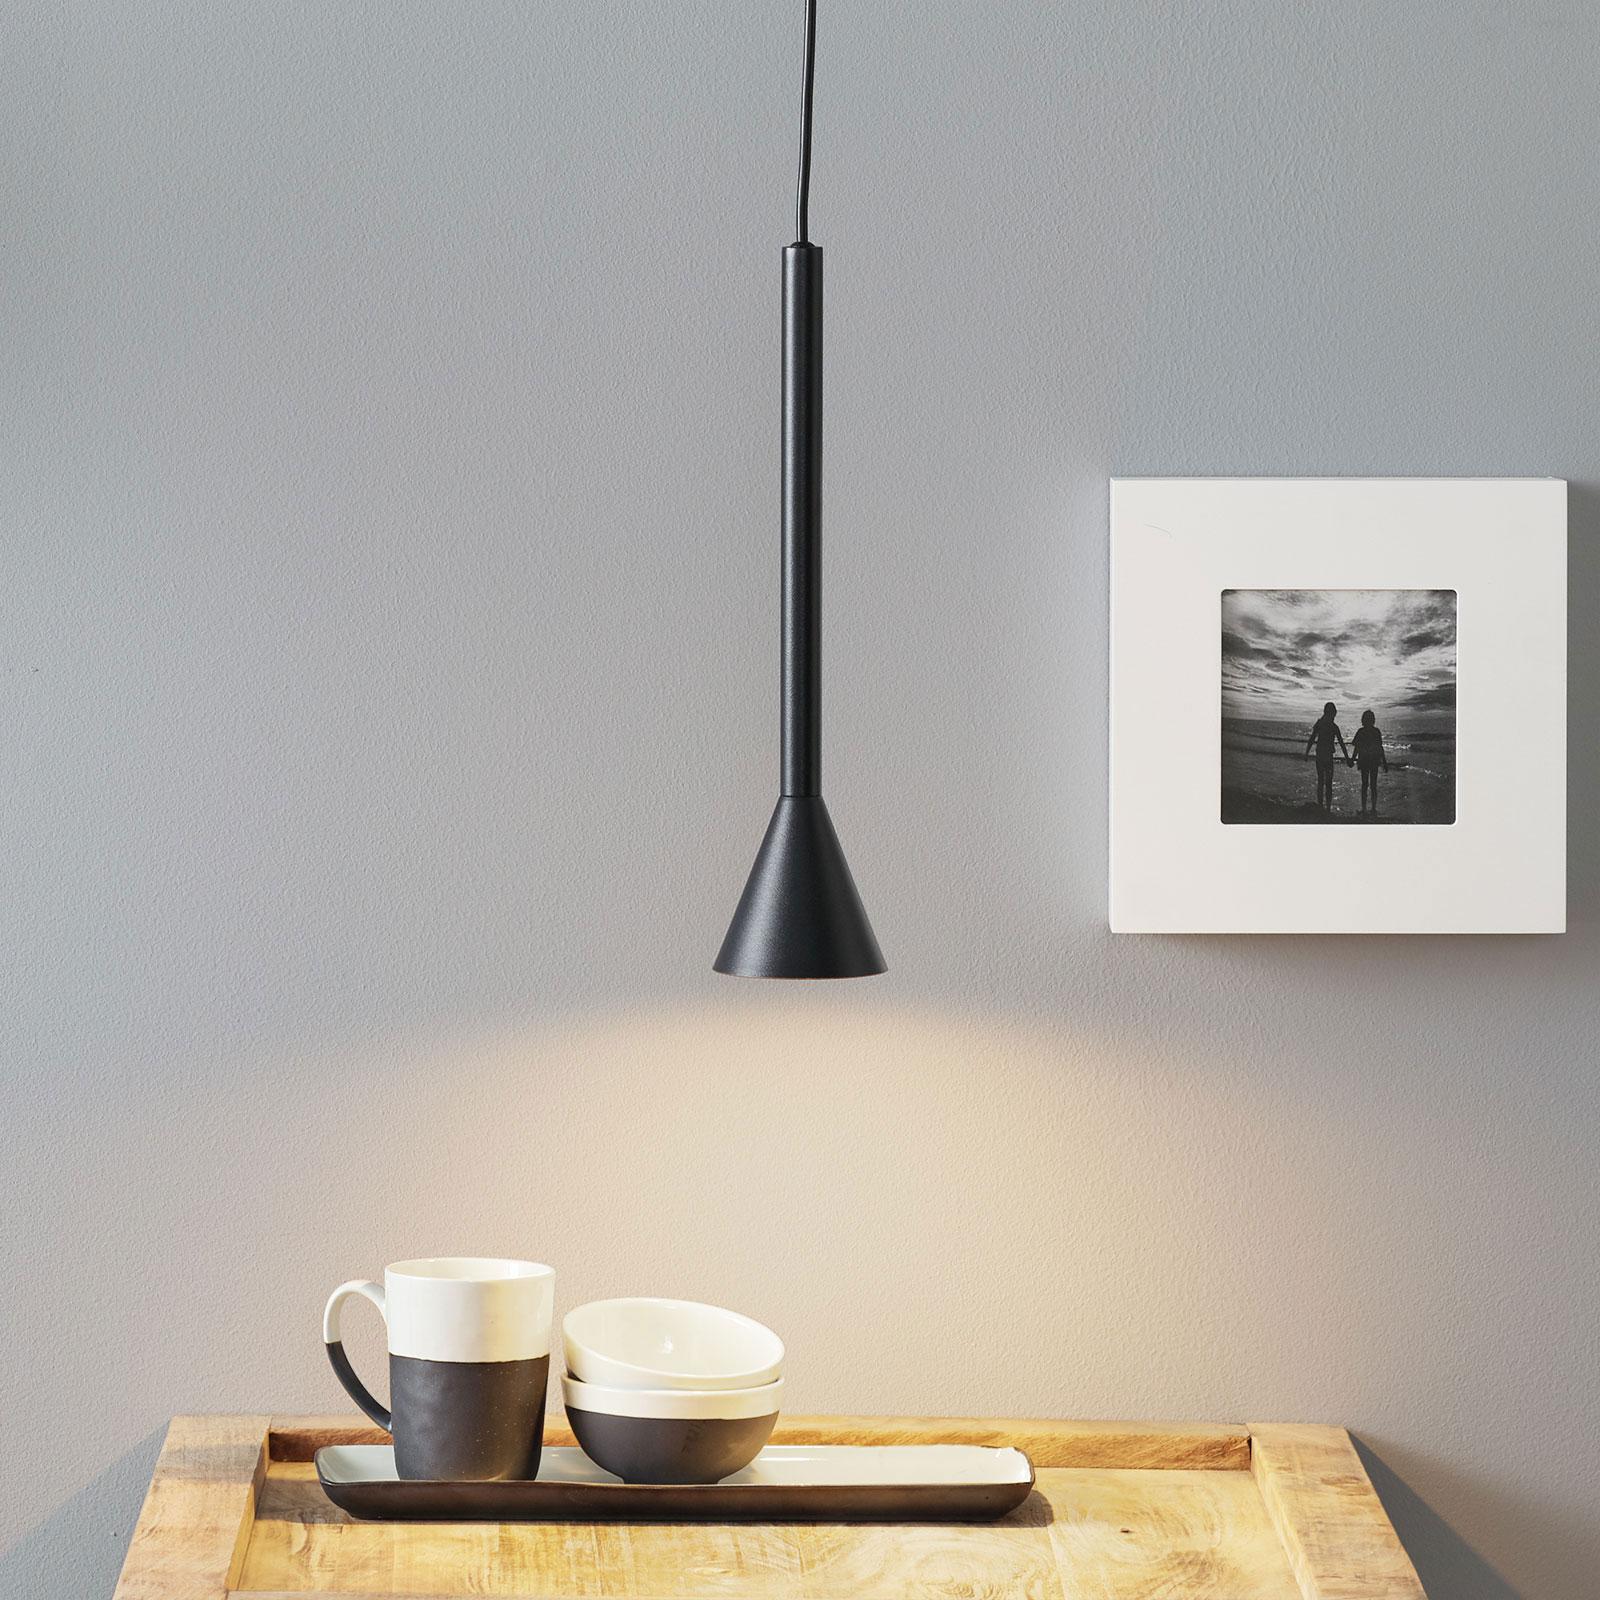 Lucande Caris hanglamp Ø8,5cm zwart/goud